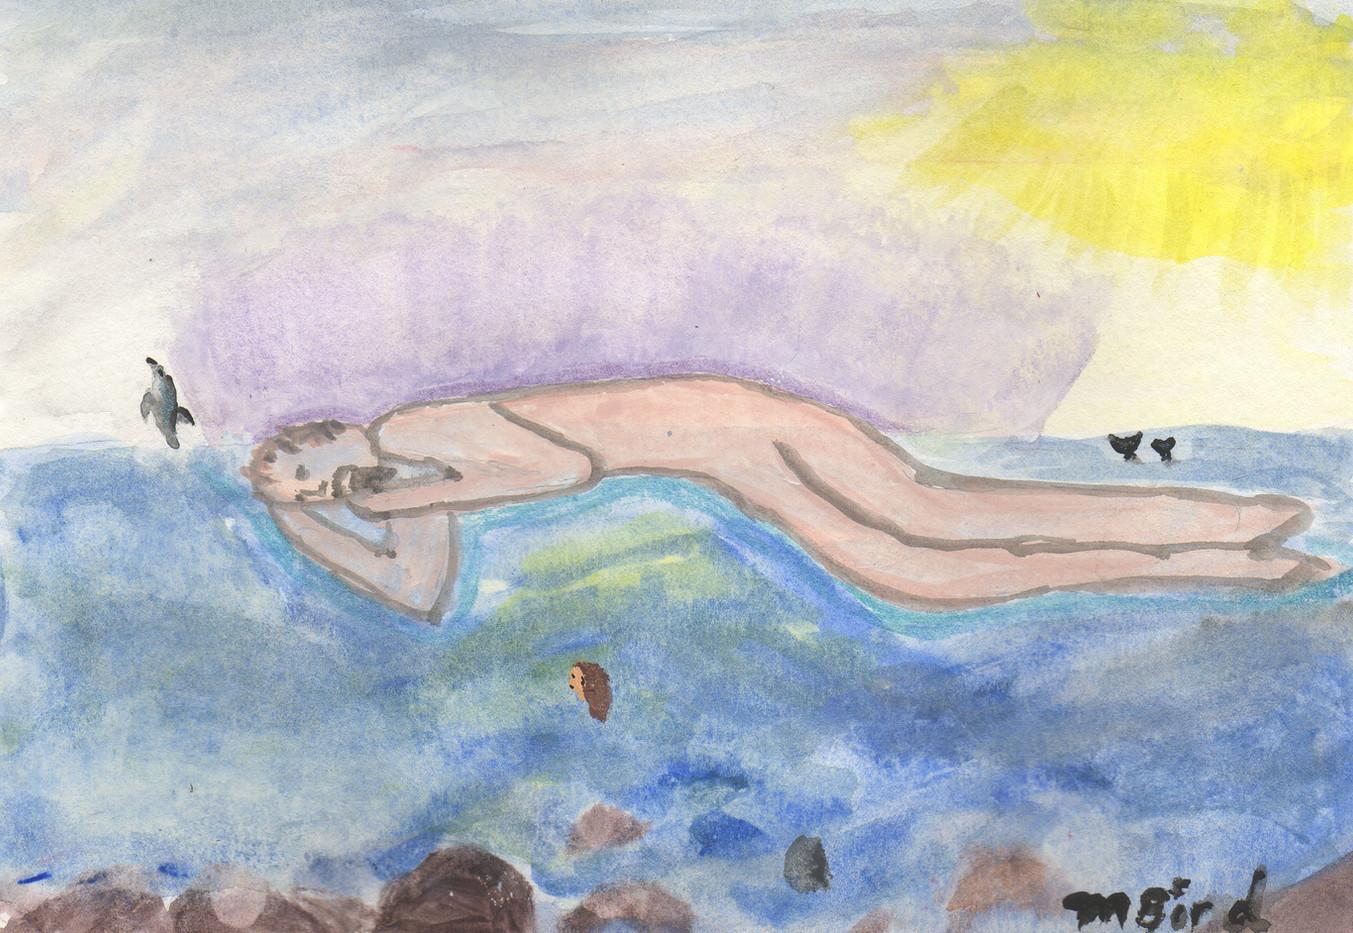 Ethereal Ocean Presence